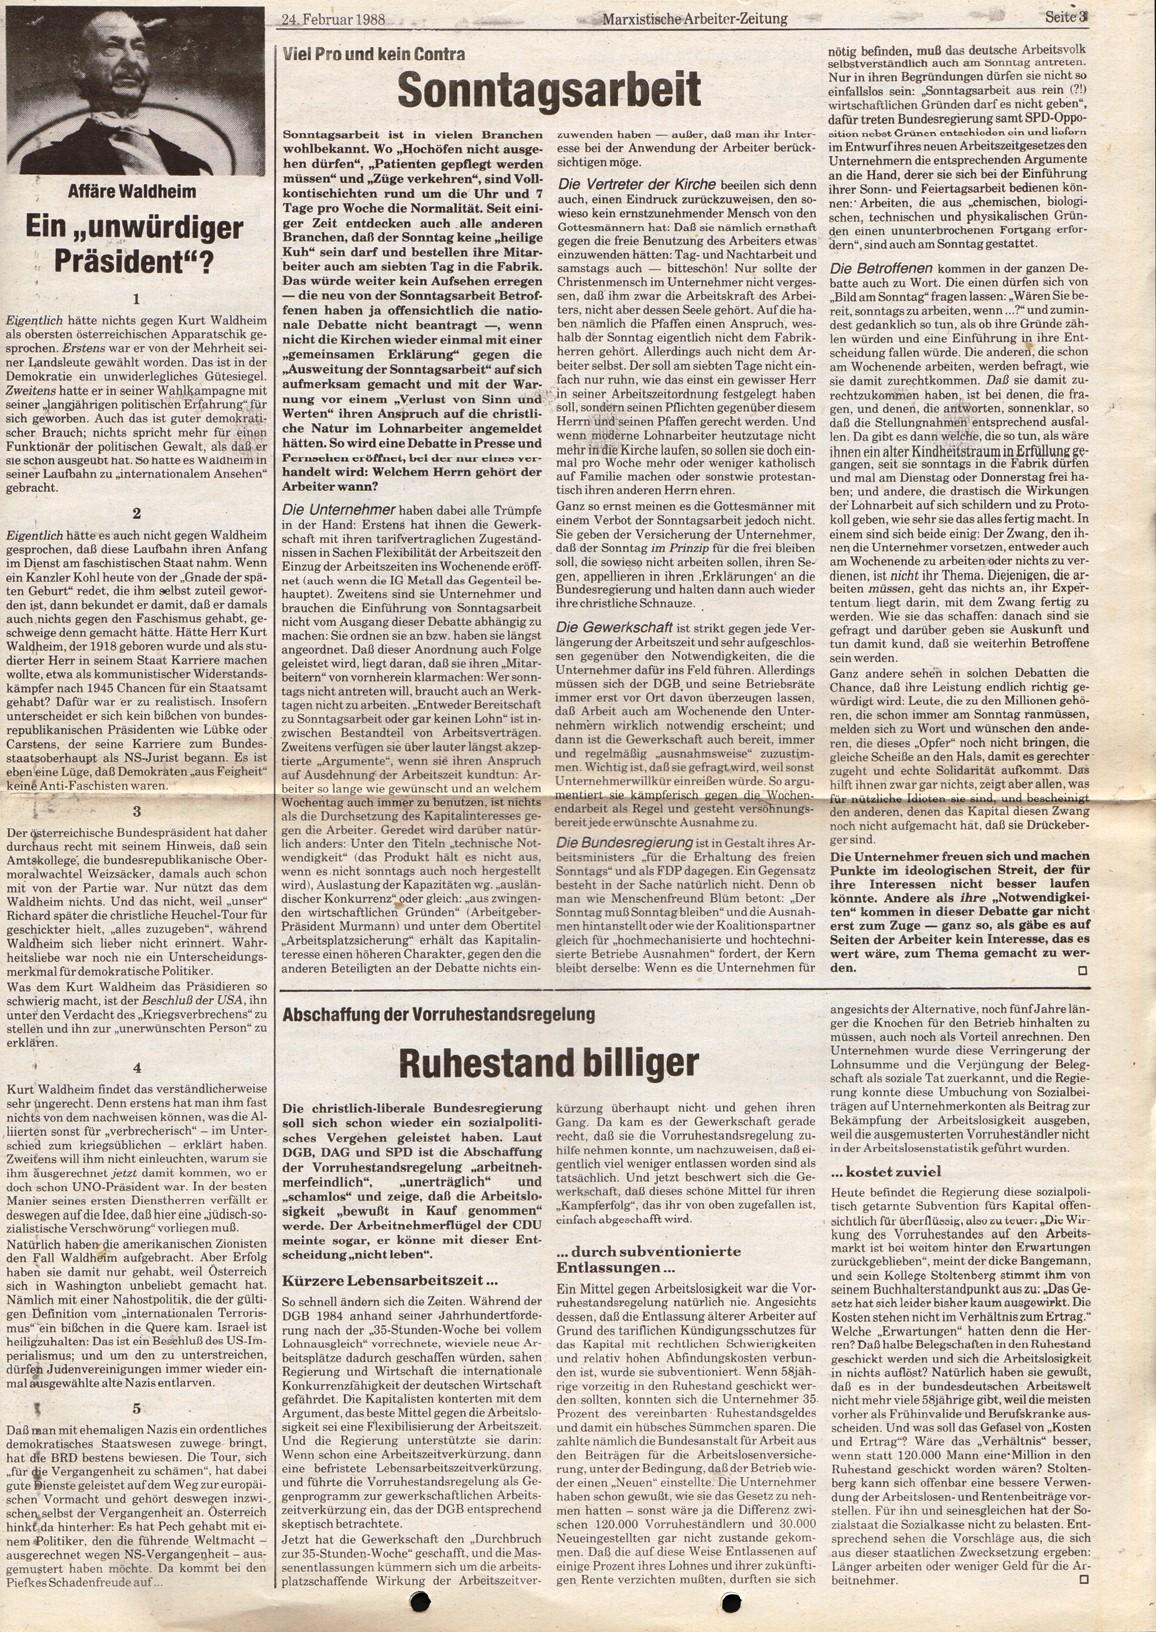 Muenchen_MG_MAZ_19880224_03